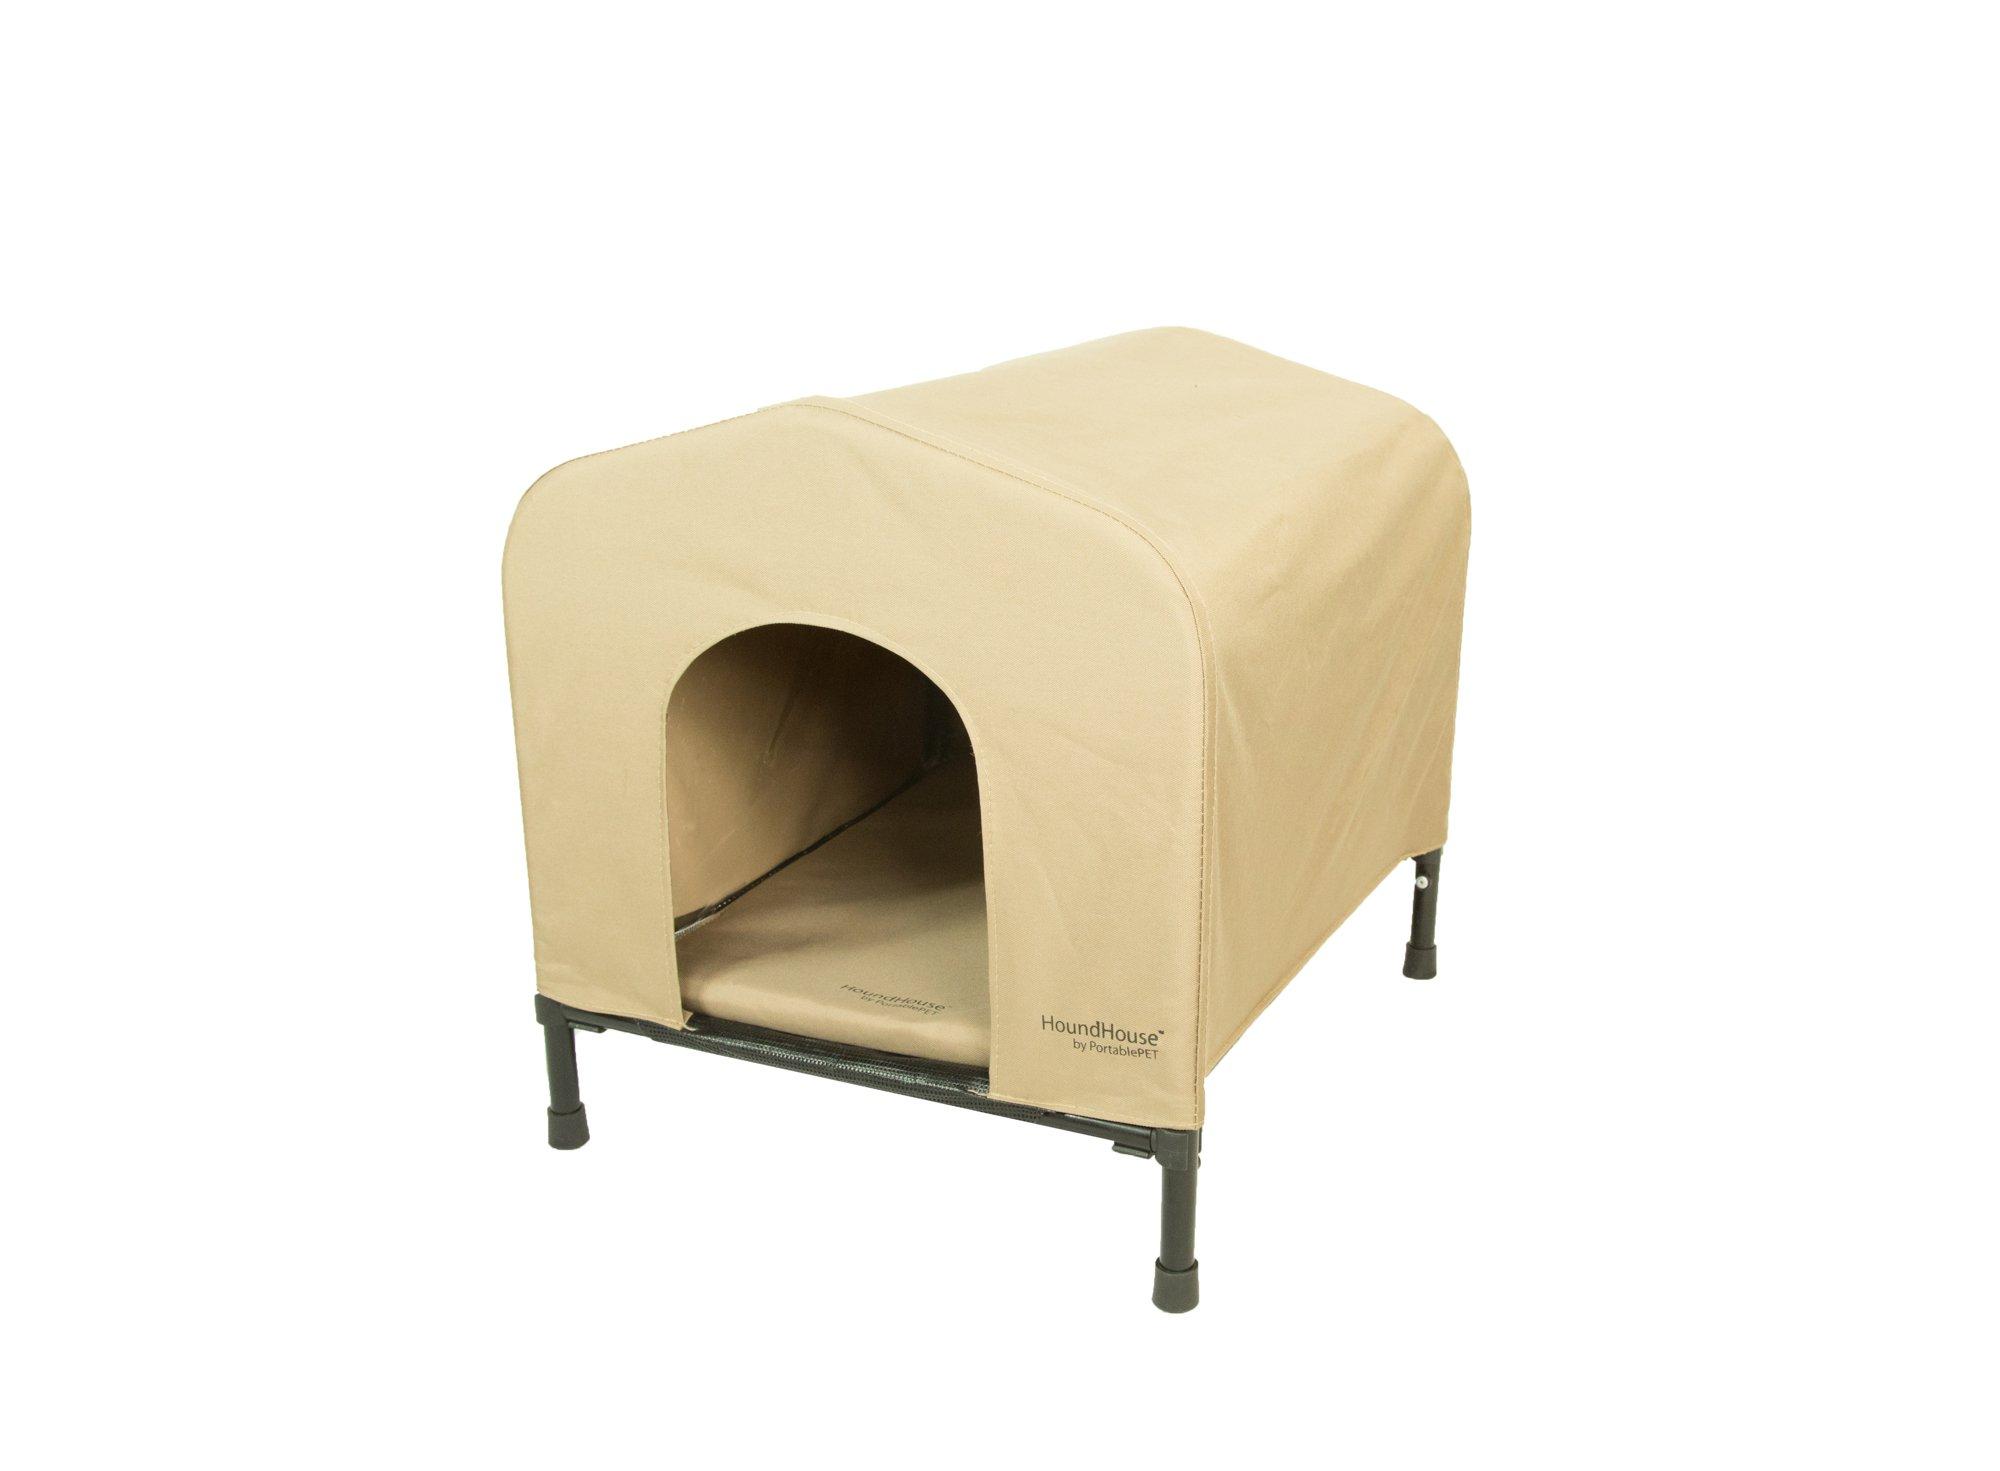 Heininger 3095 PortablePET Medium Khaki HoundHouse Kennel and Shelter